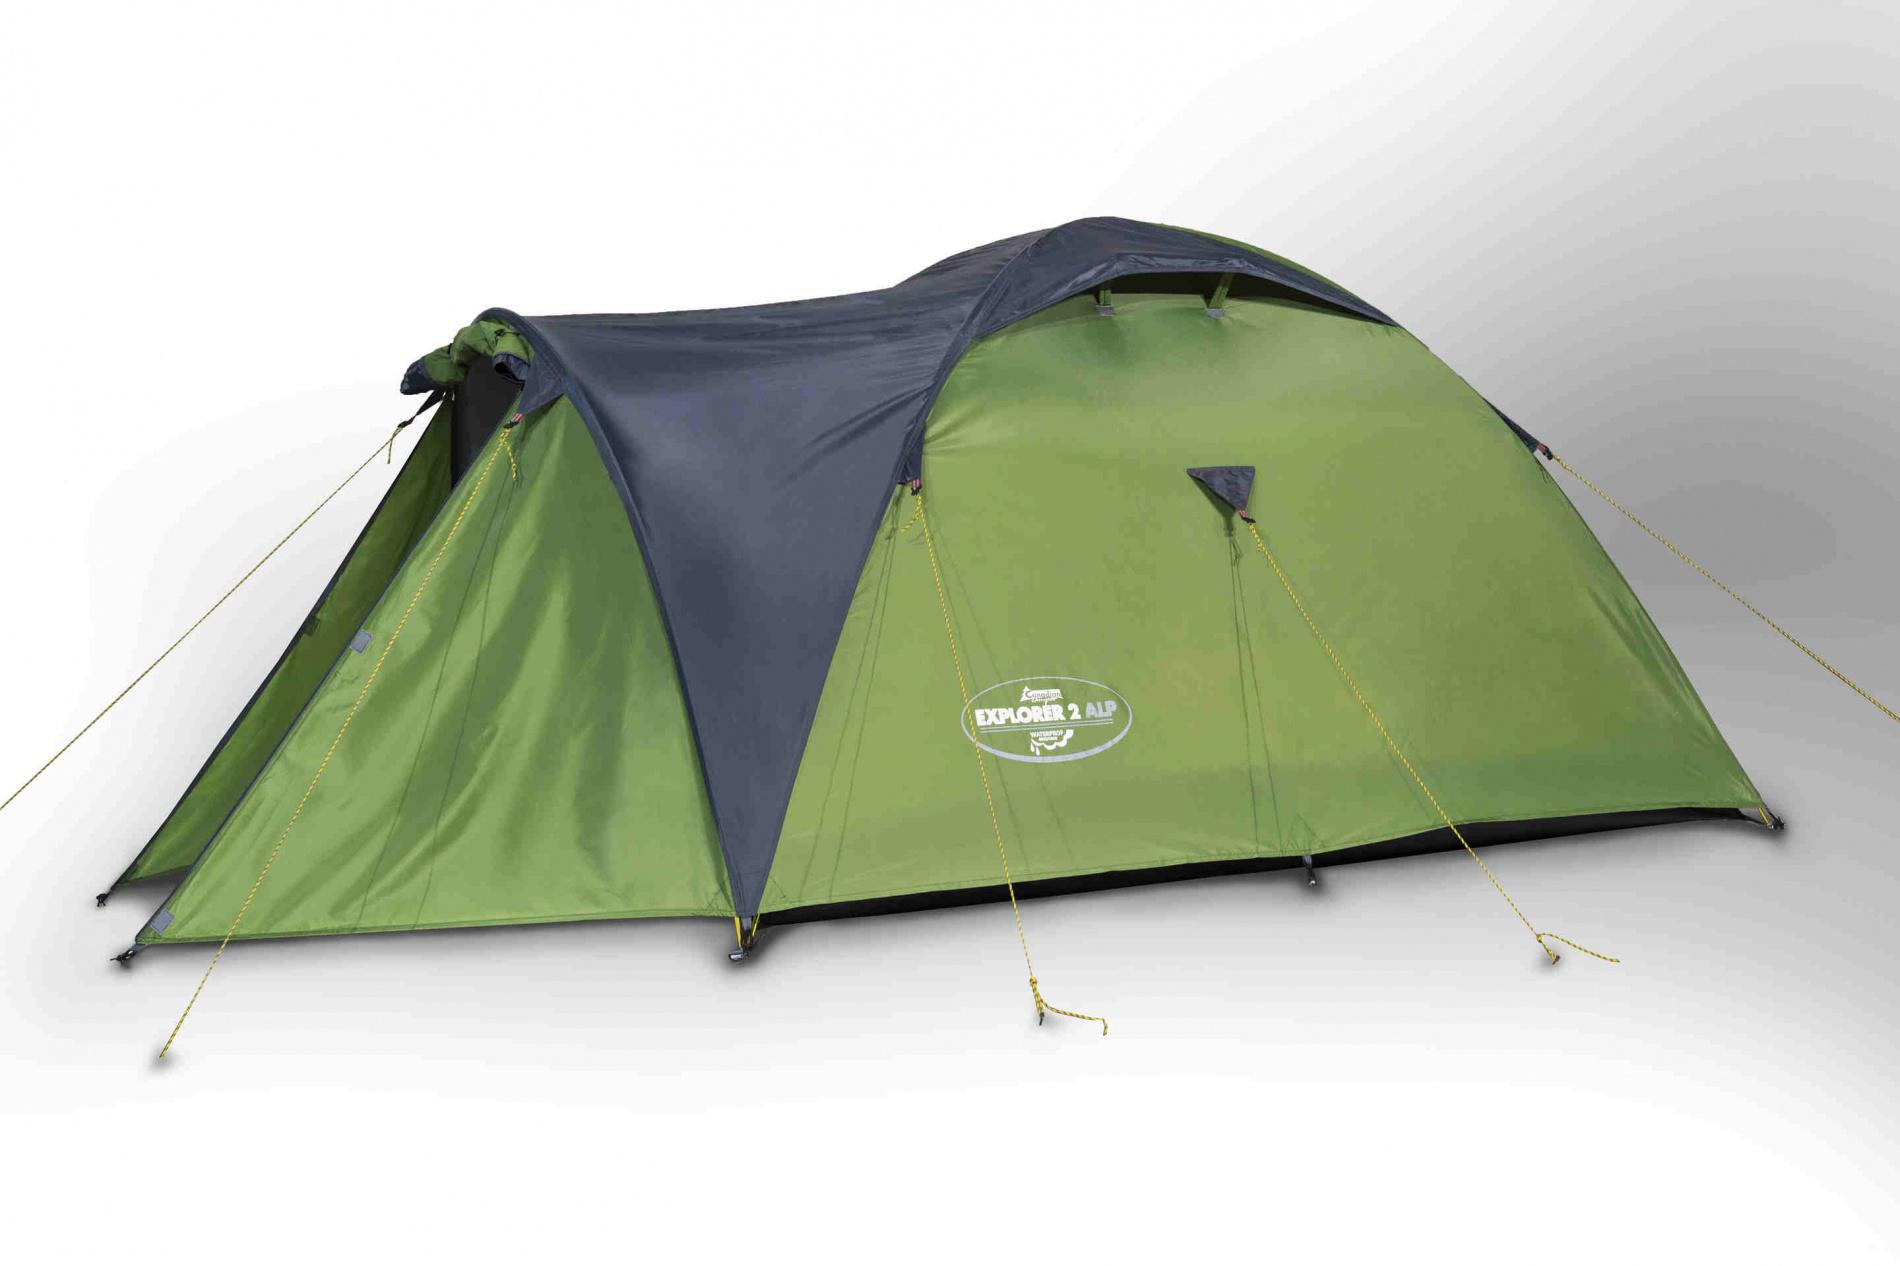 Палатка Canadian Camper EXPLORER 3 AL (цвет green) htc explorer б у